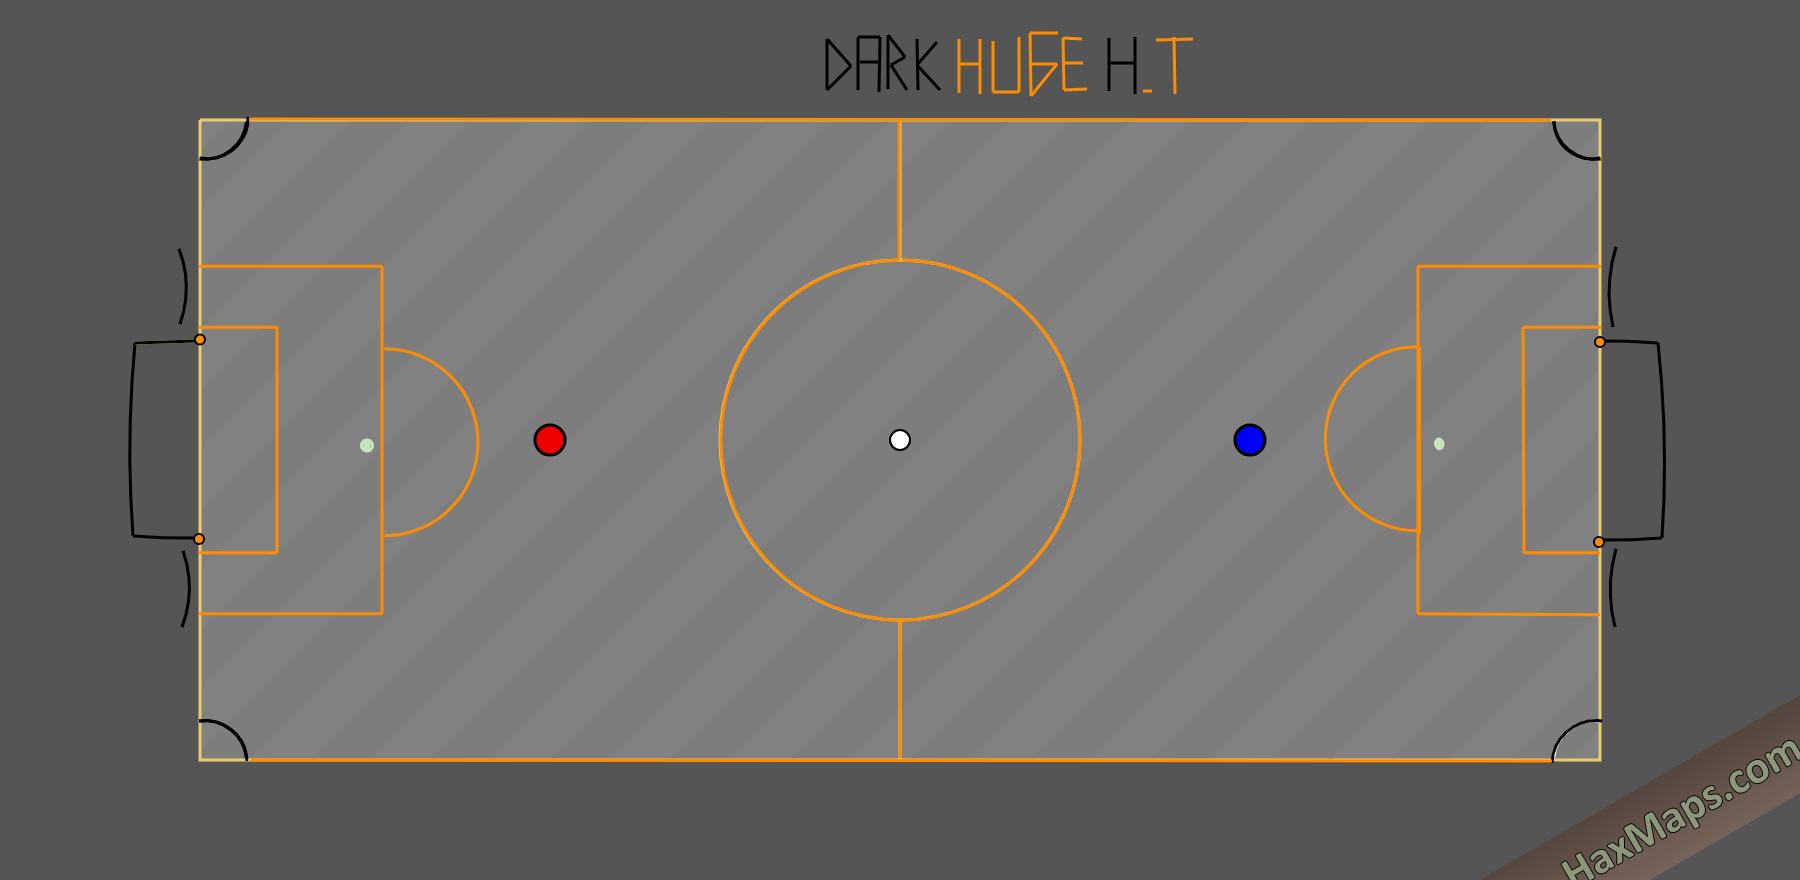 hax ball maps | Mini Real Soccer Dark Huge